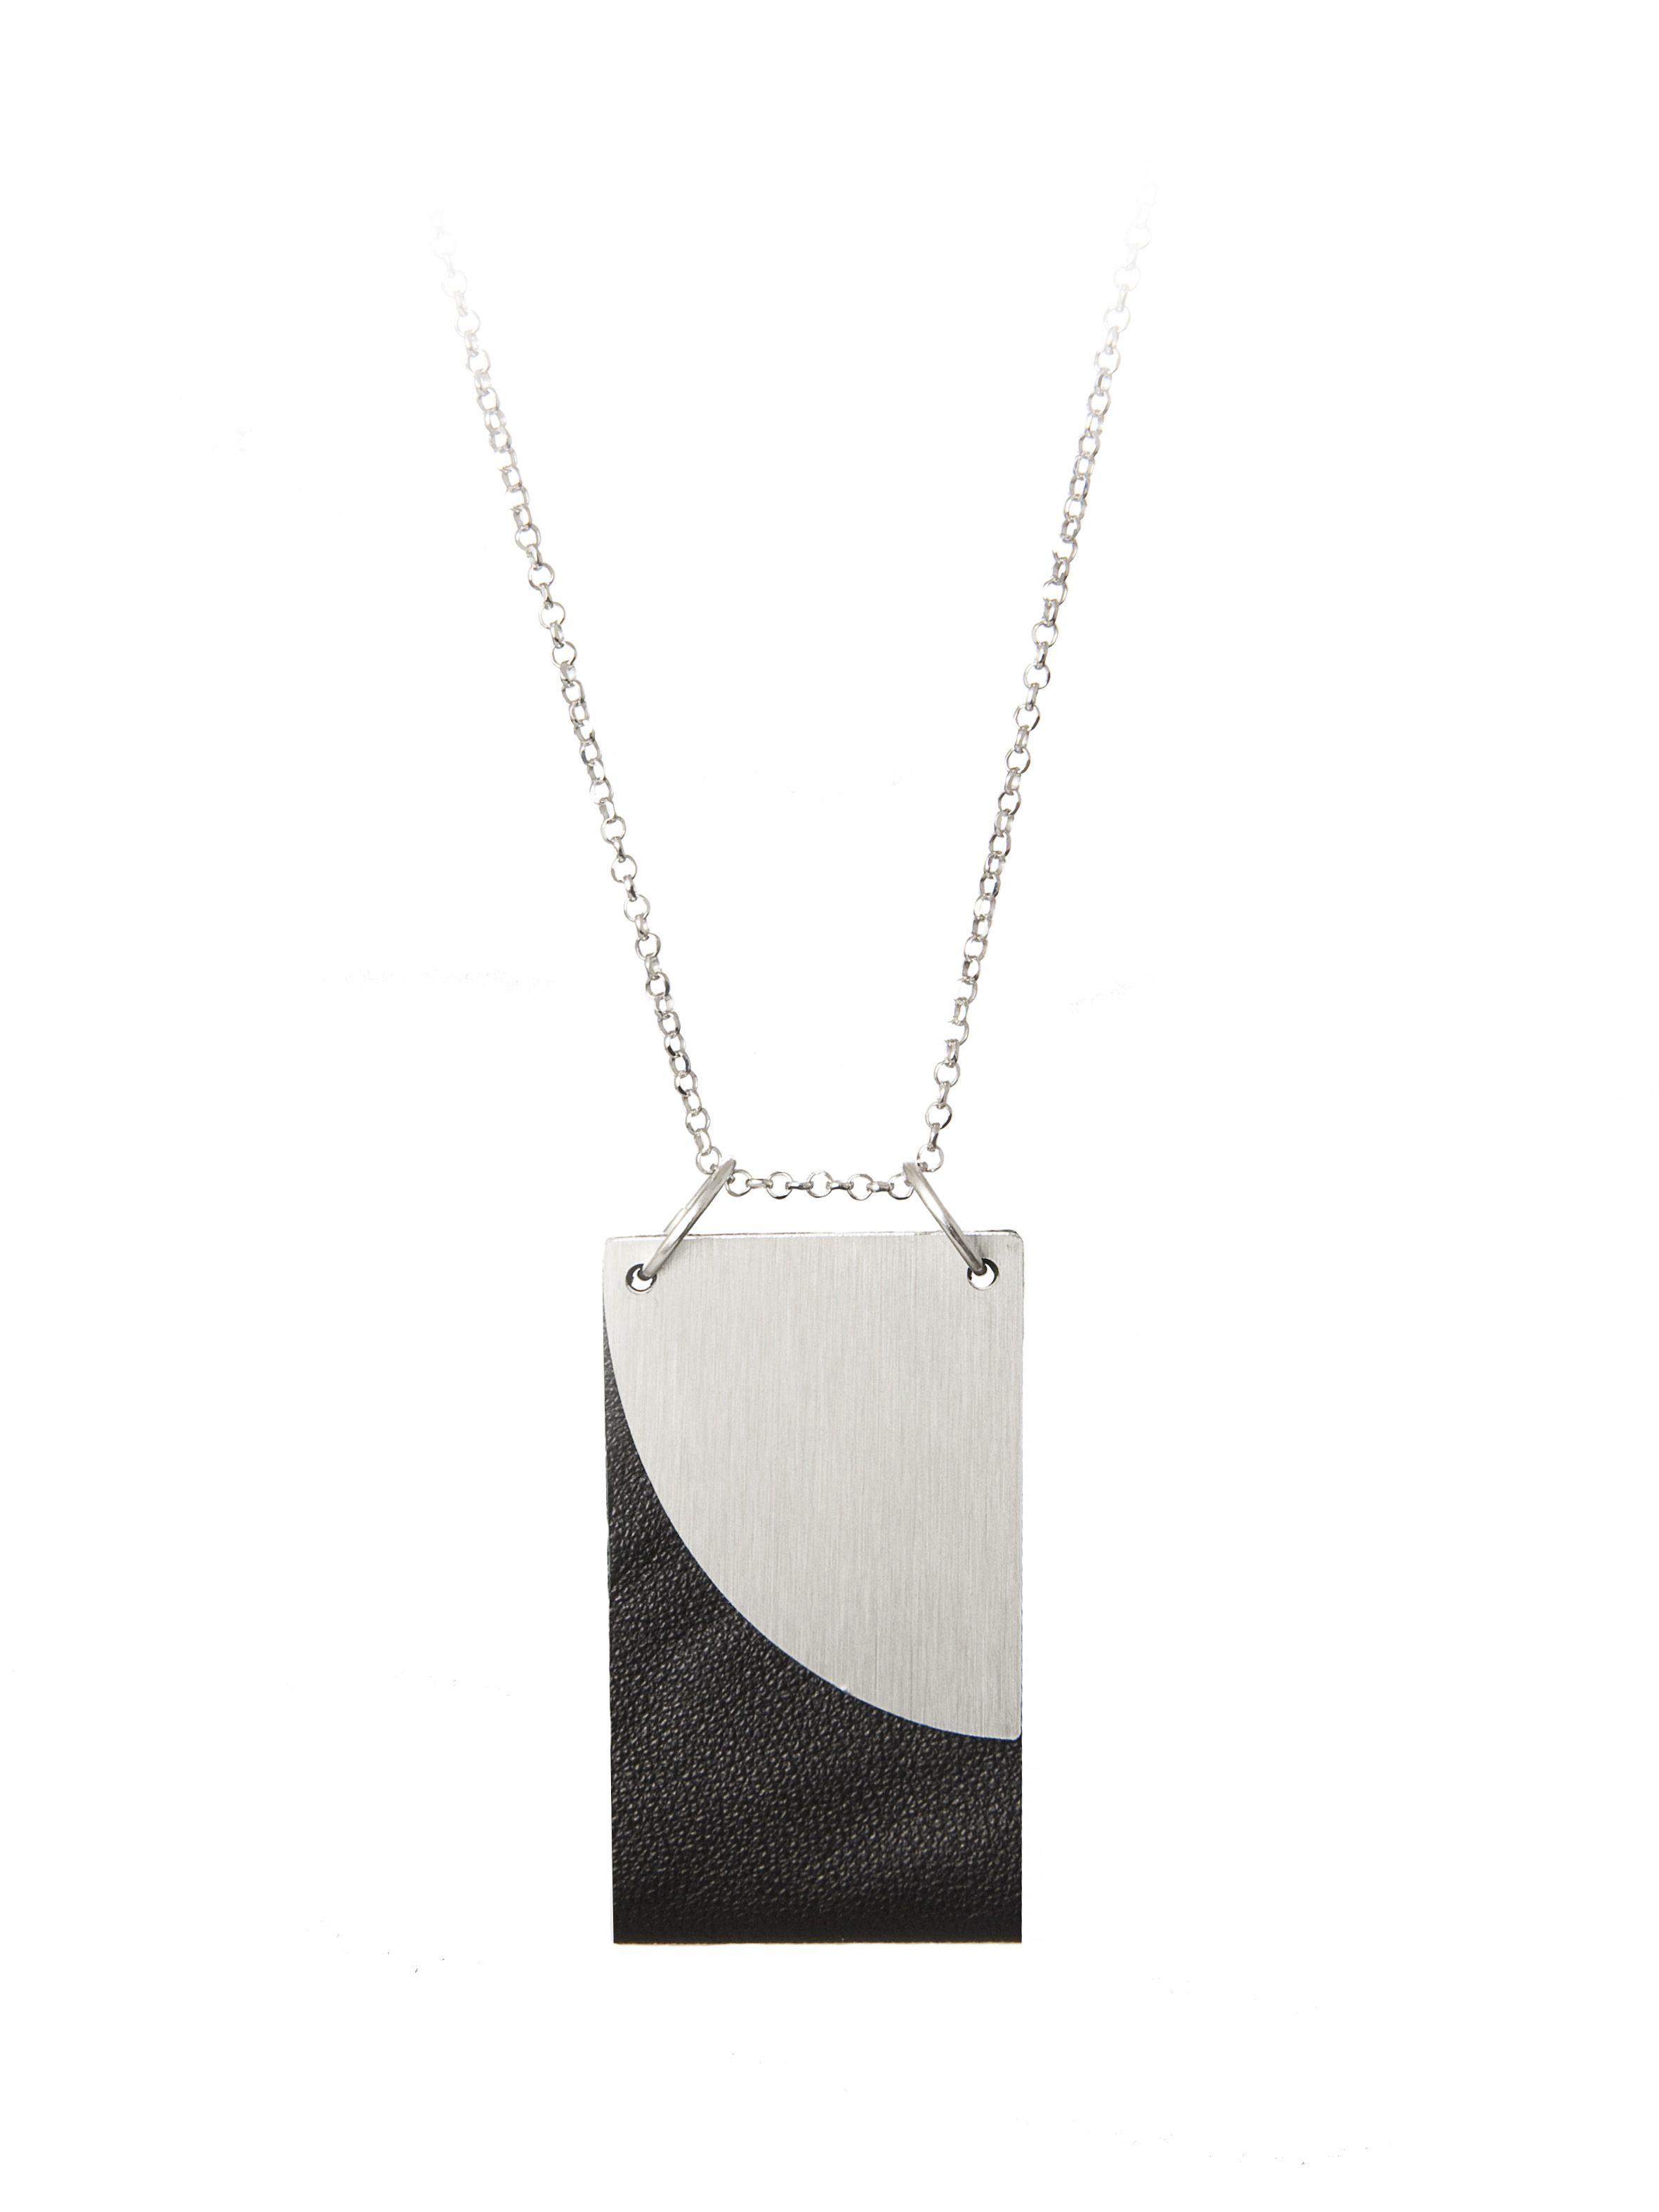 necklace / Anna Lawska jewellery